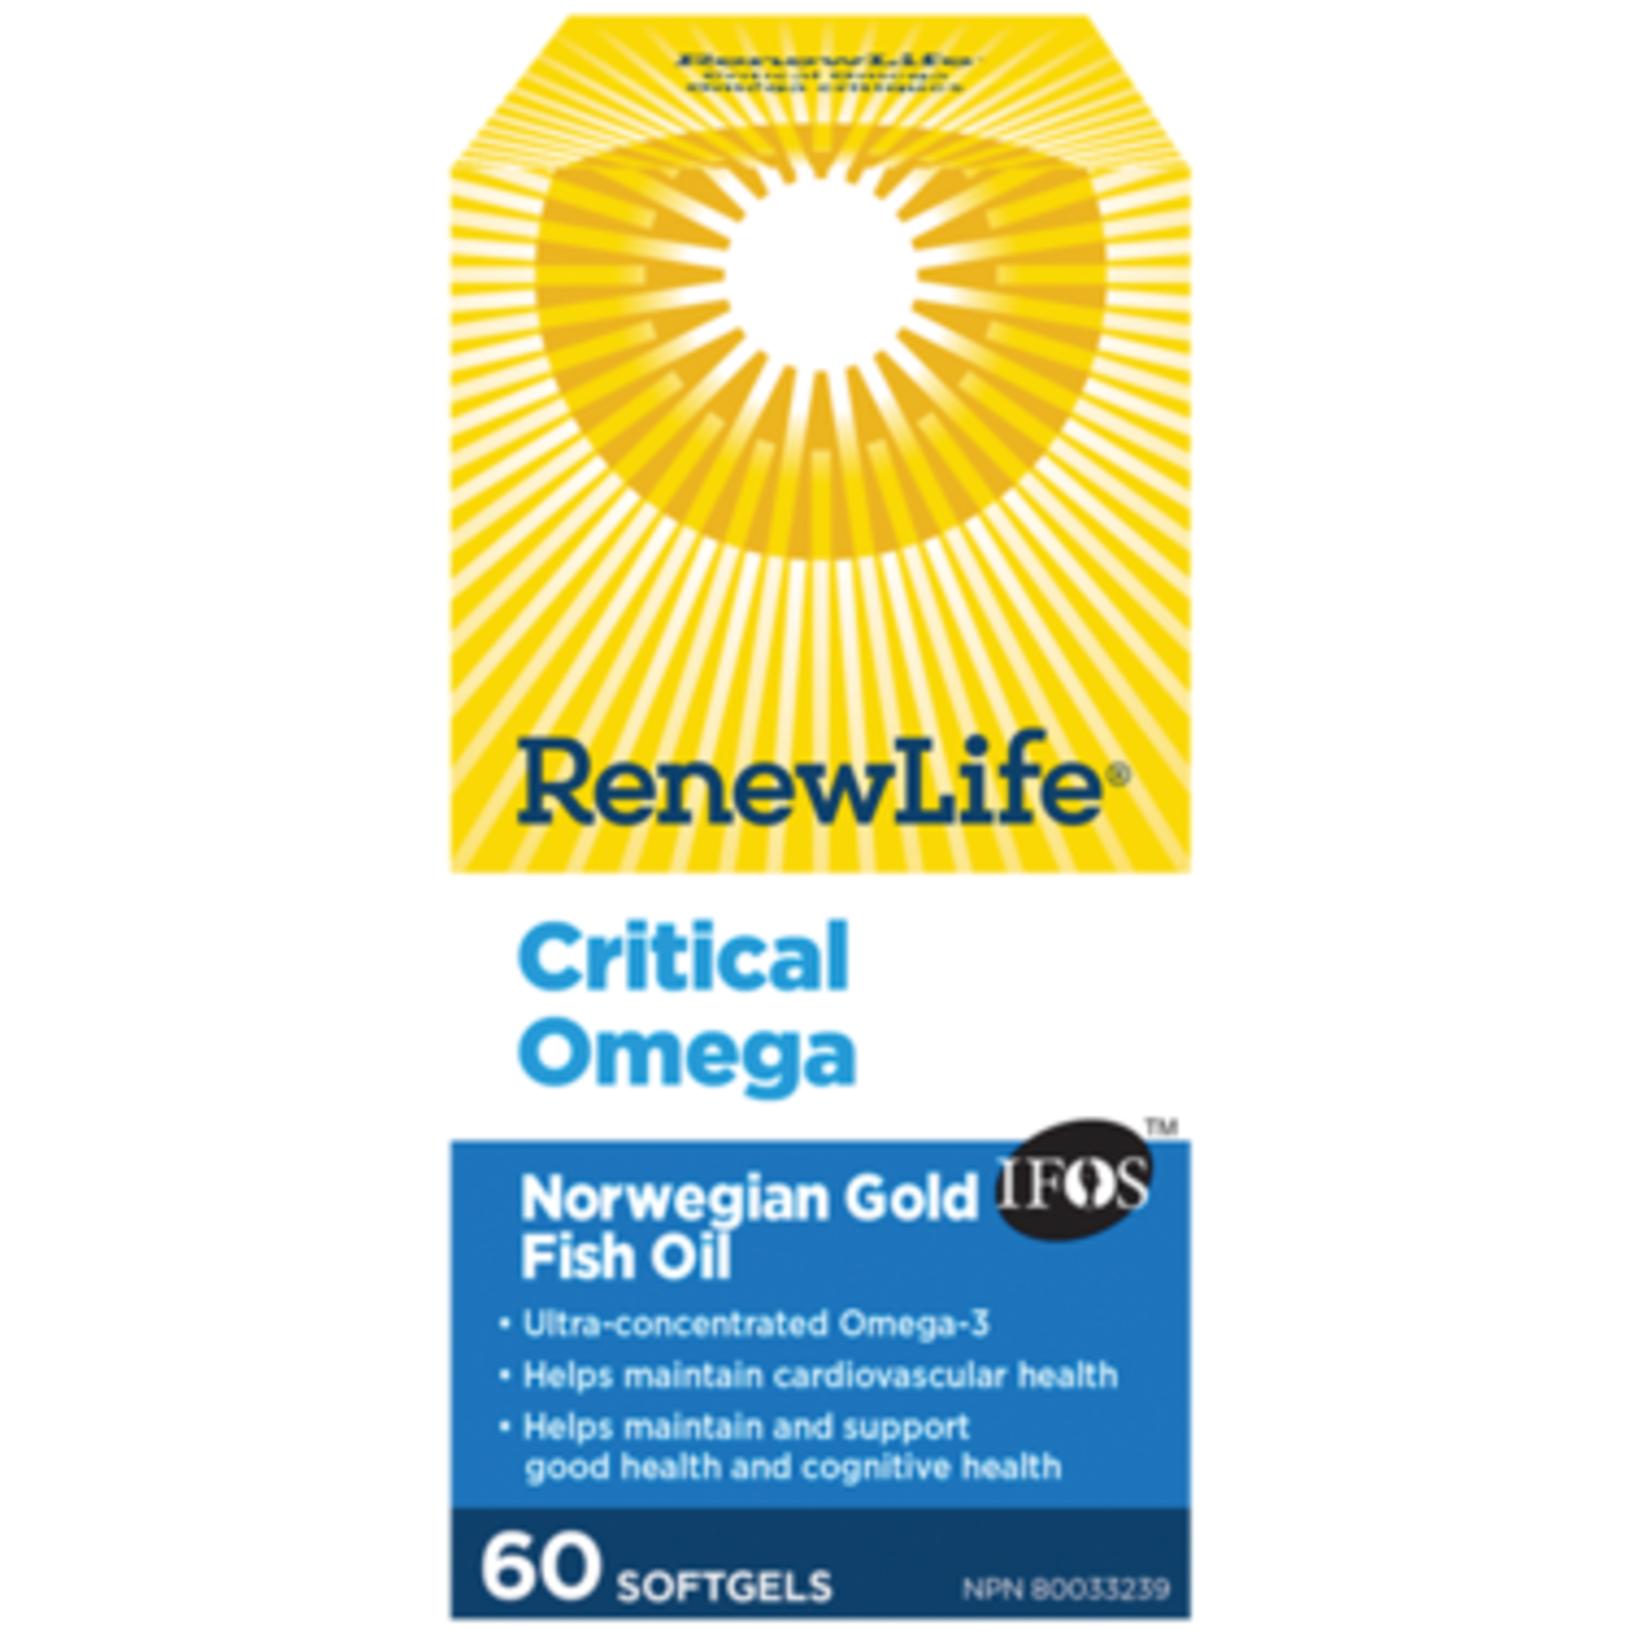 Renew Life Critical Omega Norwegian Gold Fish Oil 60 softgels